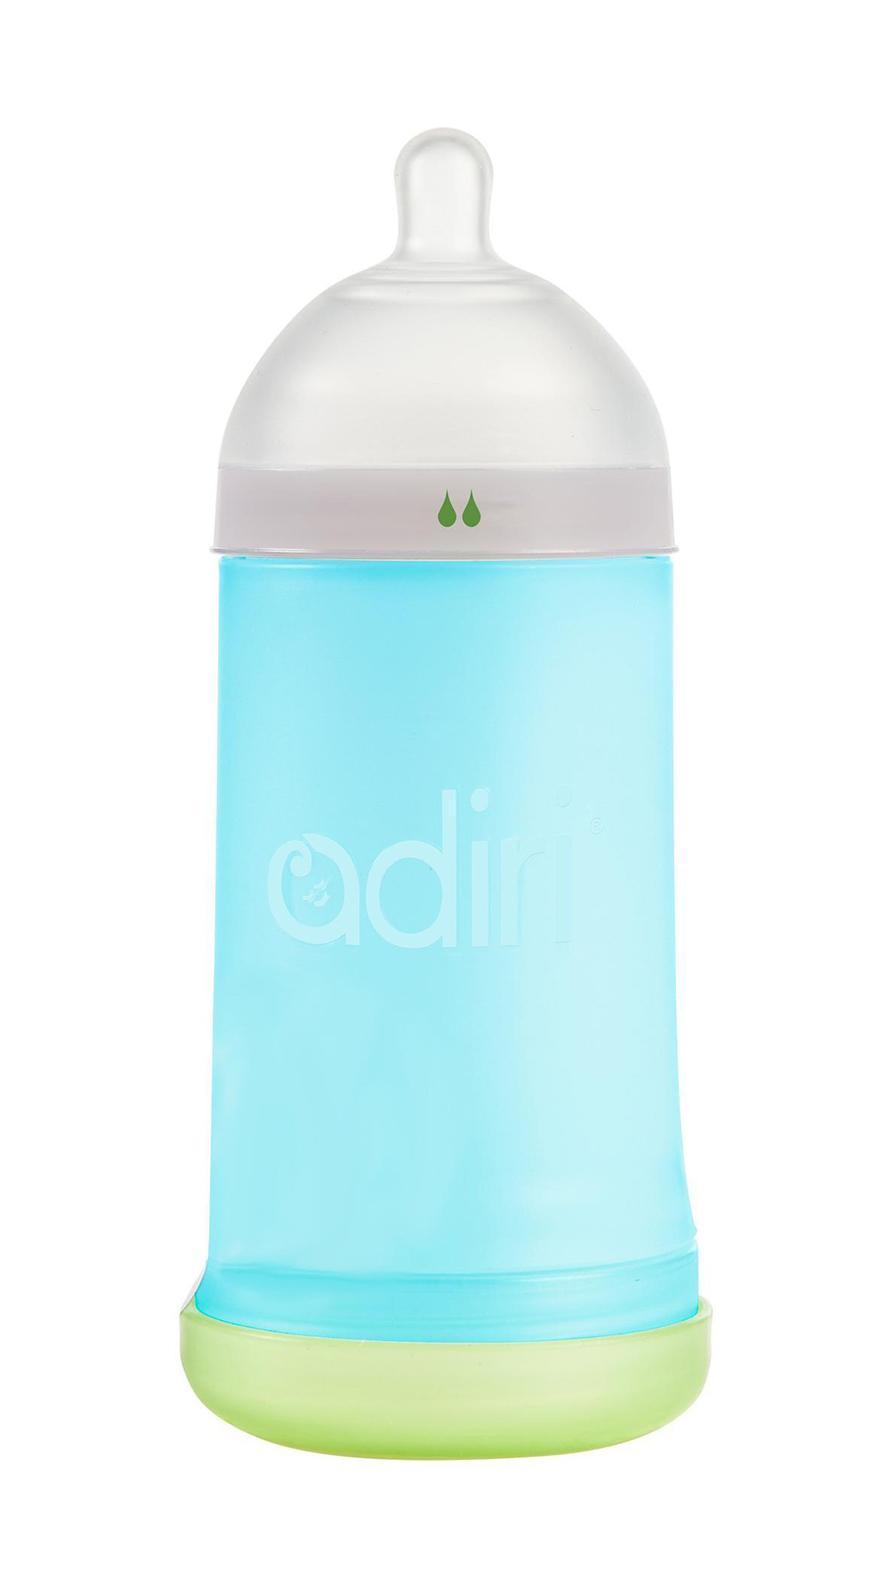 Детская бутылочка Adiri NxGen Slow Flow Blue, 3-6 мес., 281 мл.